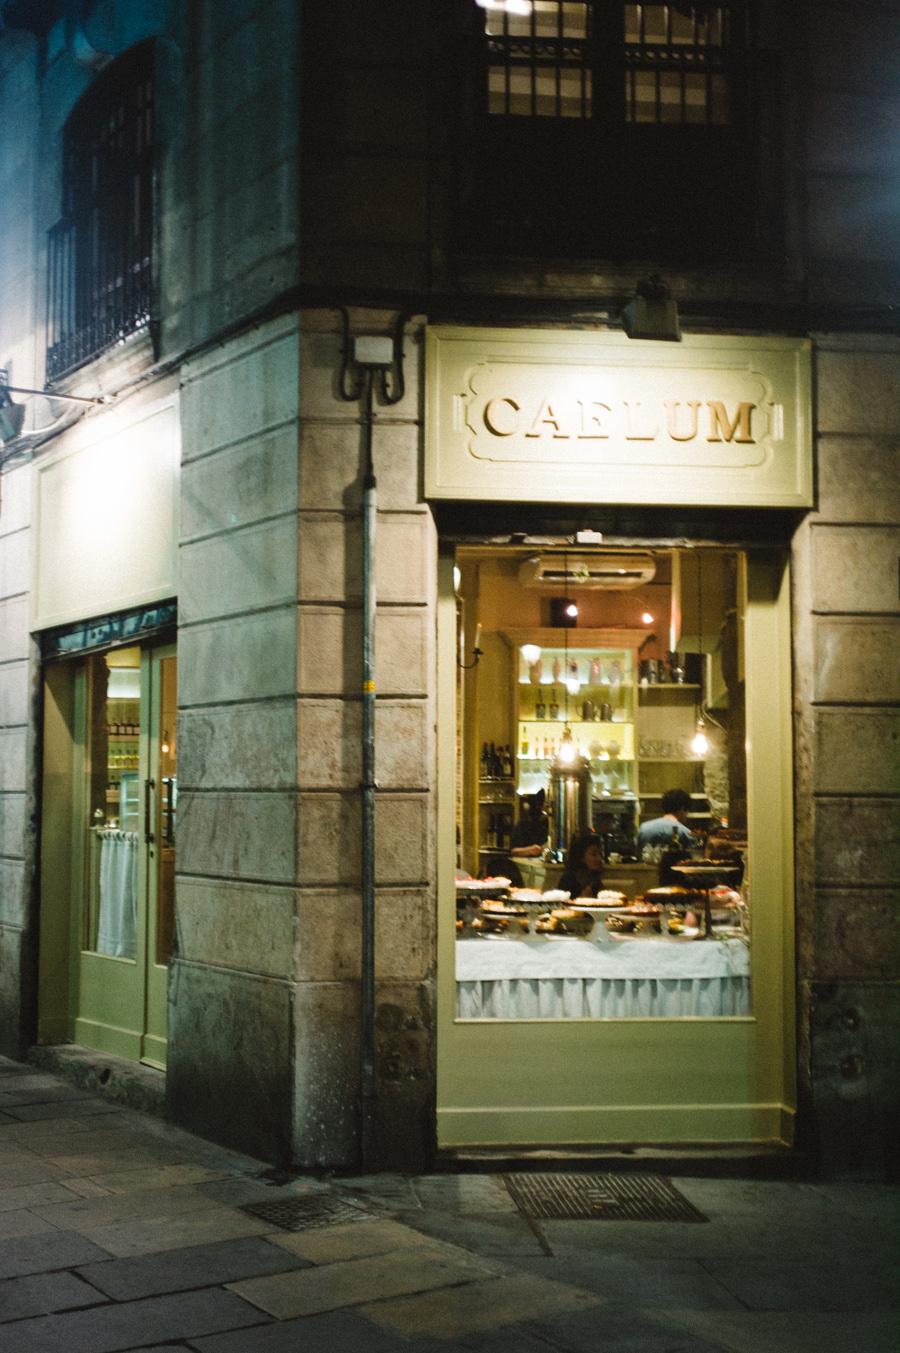 068-barcelona.jpg